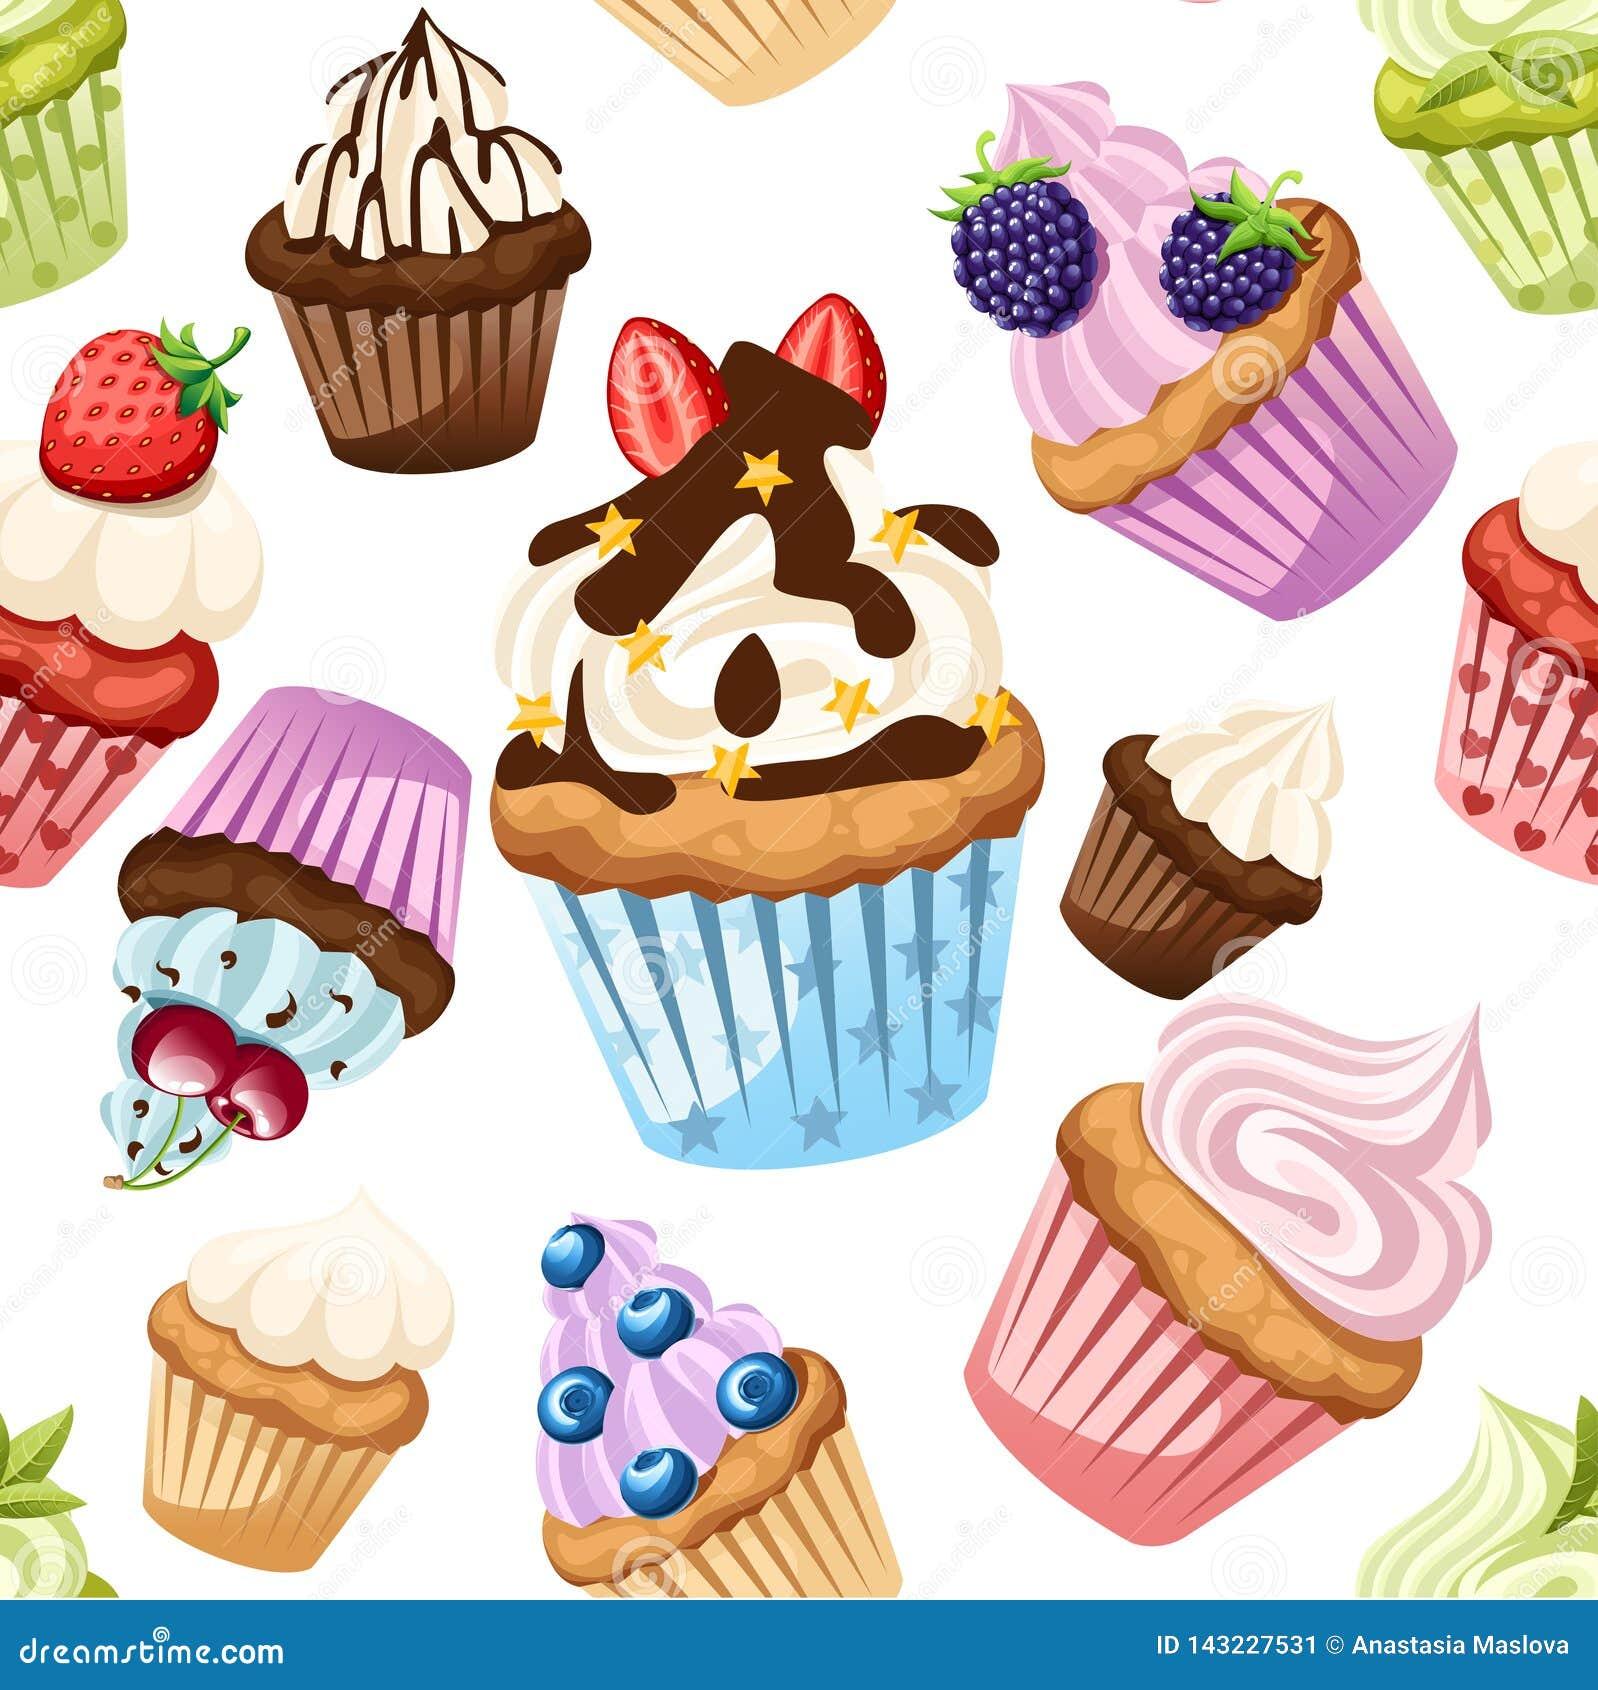 R Συλλογή των cupcakes με τα διαφορετικά συστατικά Σύνολο γλυκών κέικ Ζωηρόχρωμο επιδόρπιο E